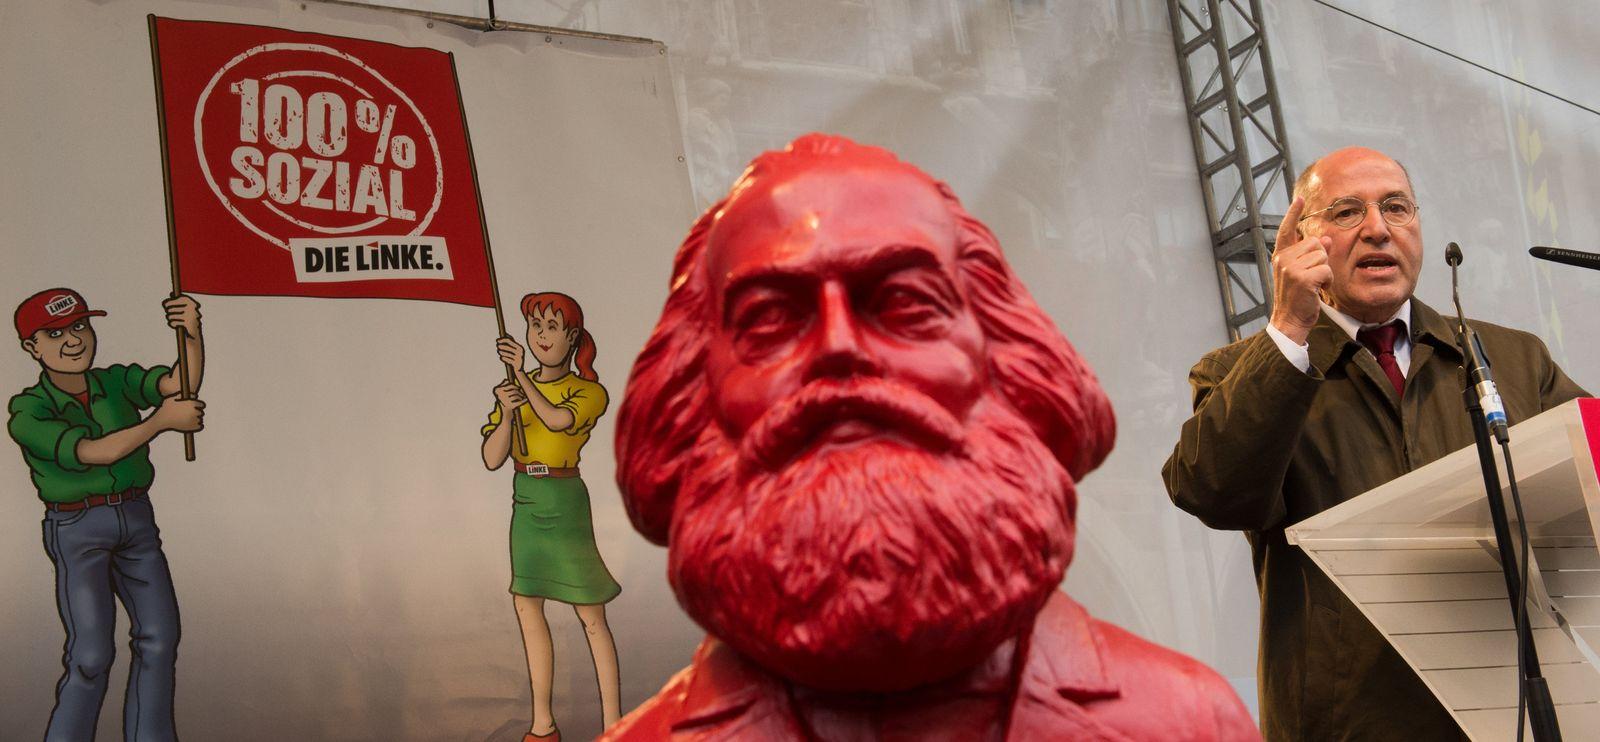 Abschlusskundgebung Linke Gregor Gysi